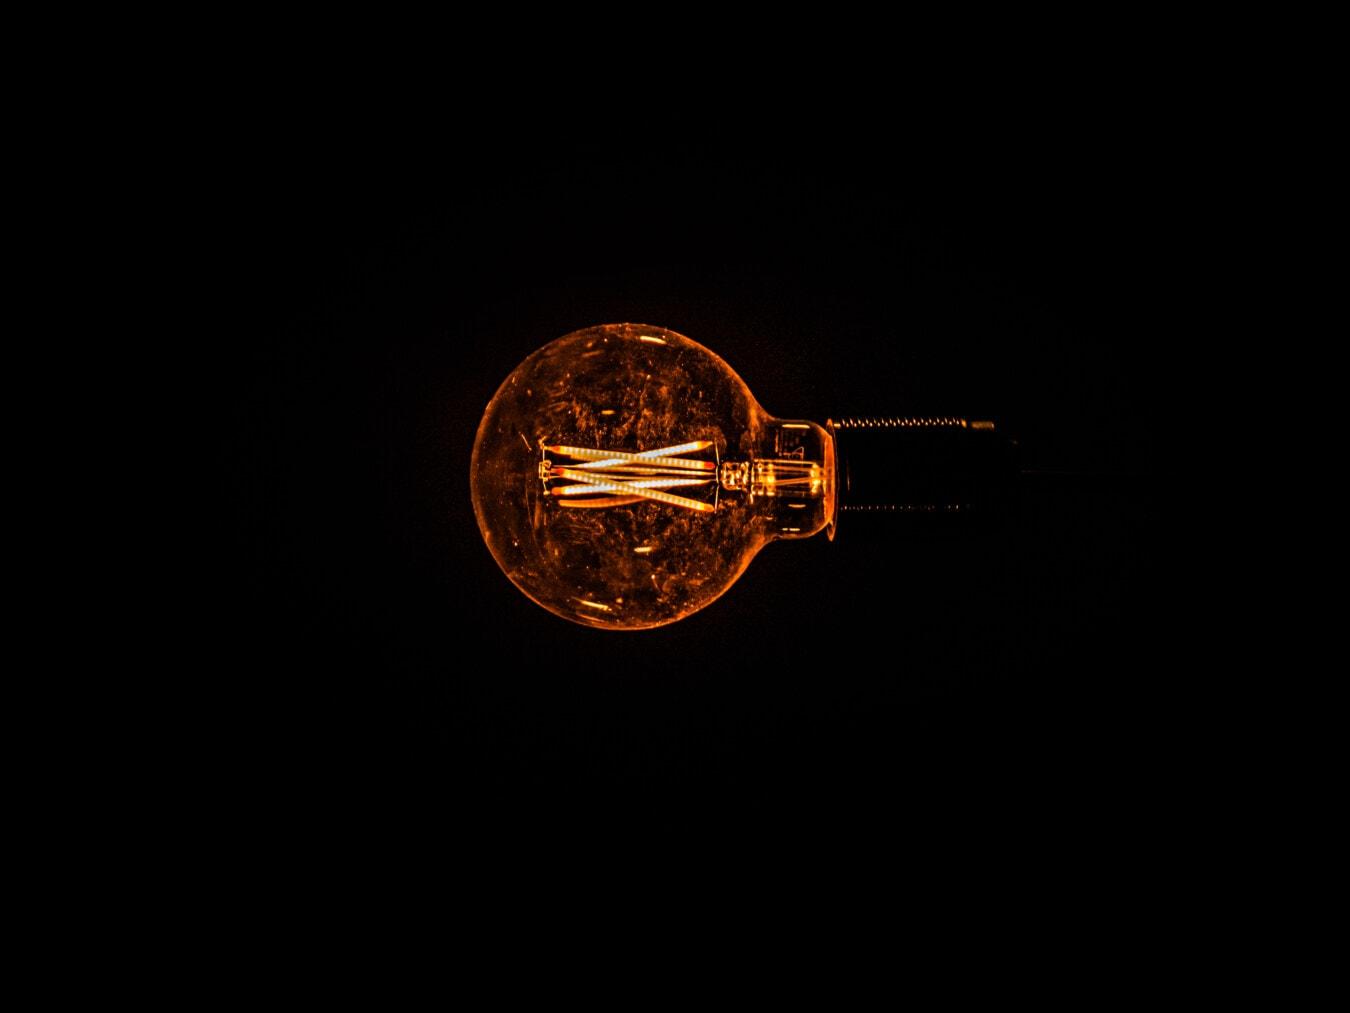 historic, old style, vintage, light bulb, background, black, flare, wires, lamp, dark